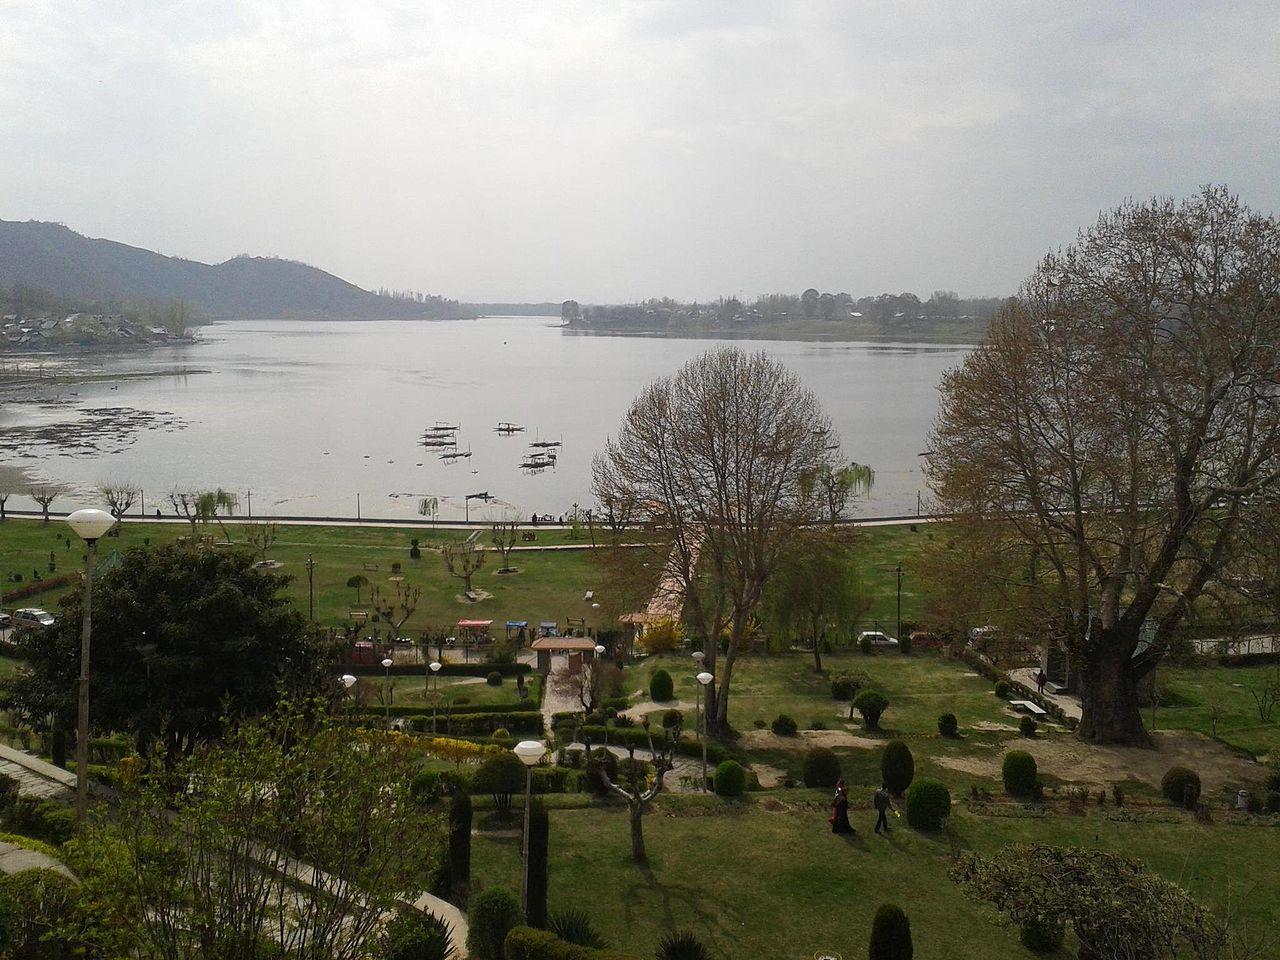 Top Place to See in Anantnag, Jammu and Kashmir-Manasbal Lake